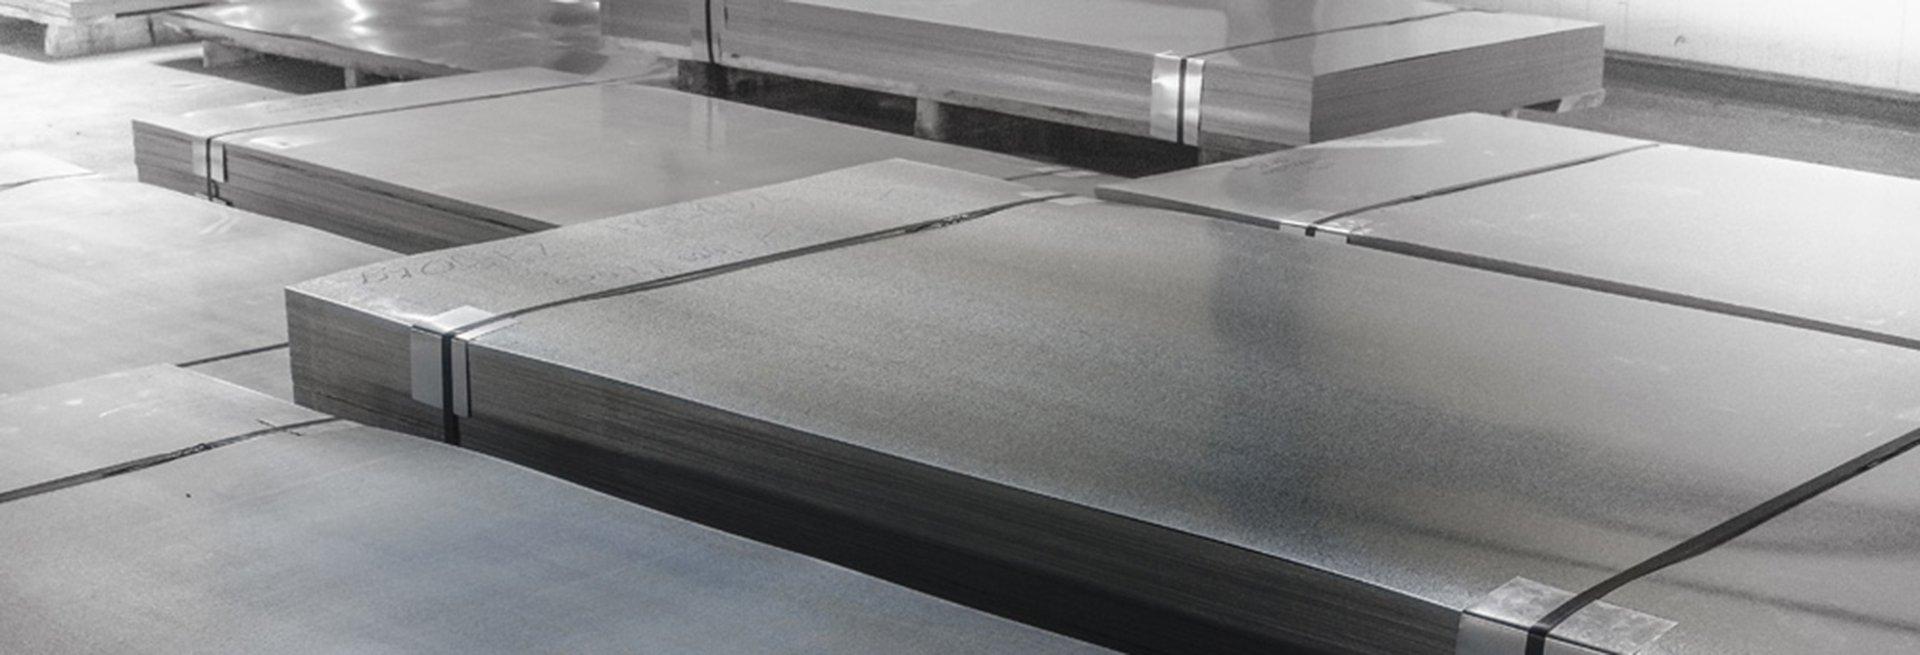 "1//8/"" Stainless Steel Plate 1//8/""X 4/""X 12/"" 304 SS 11 Gauge 11 ga"